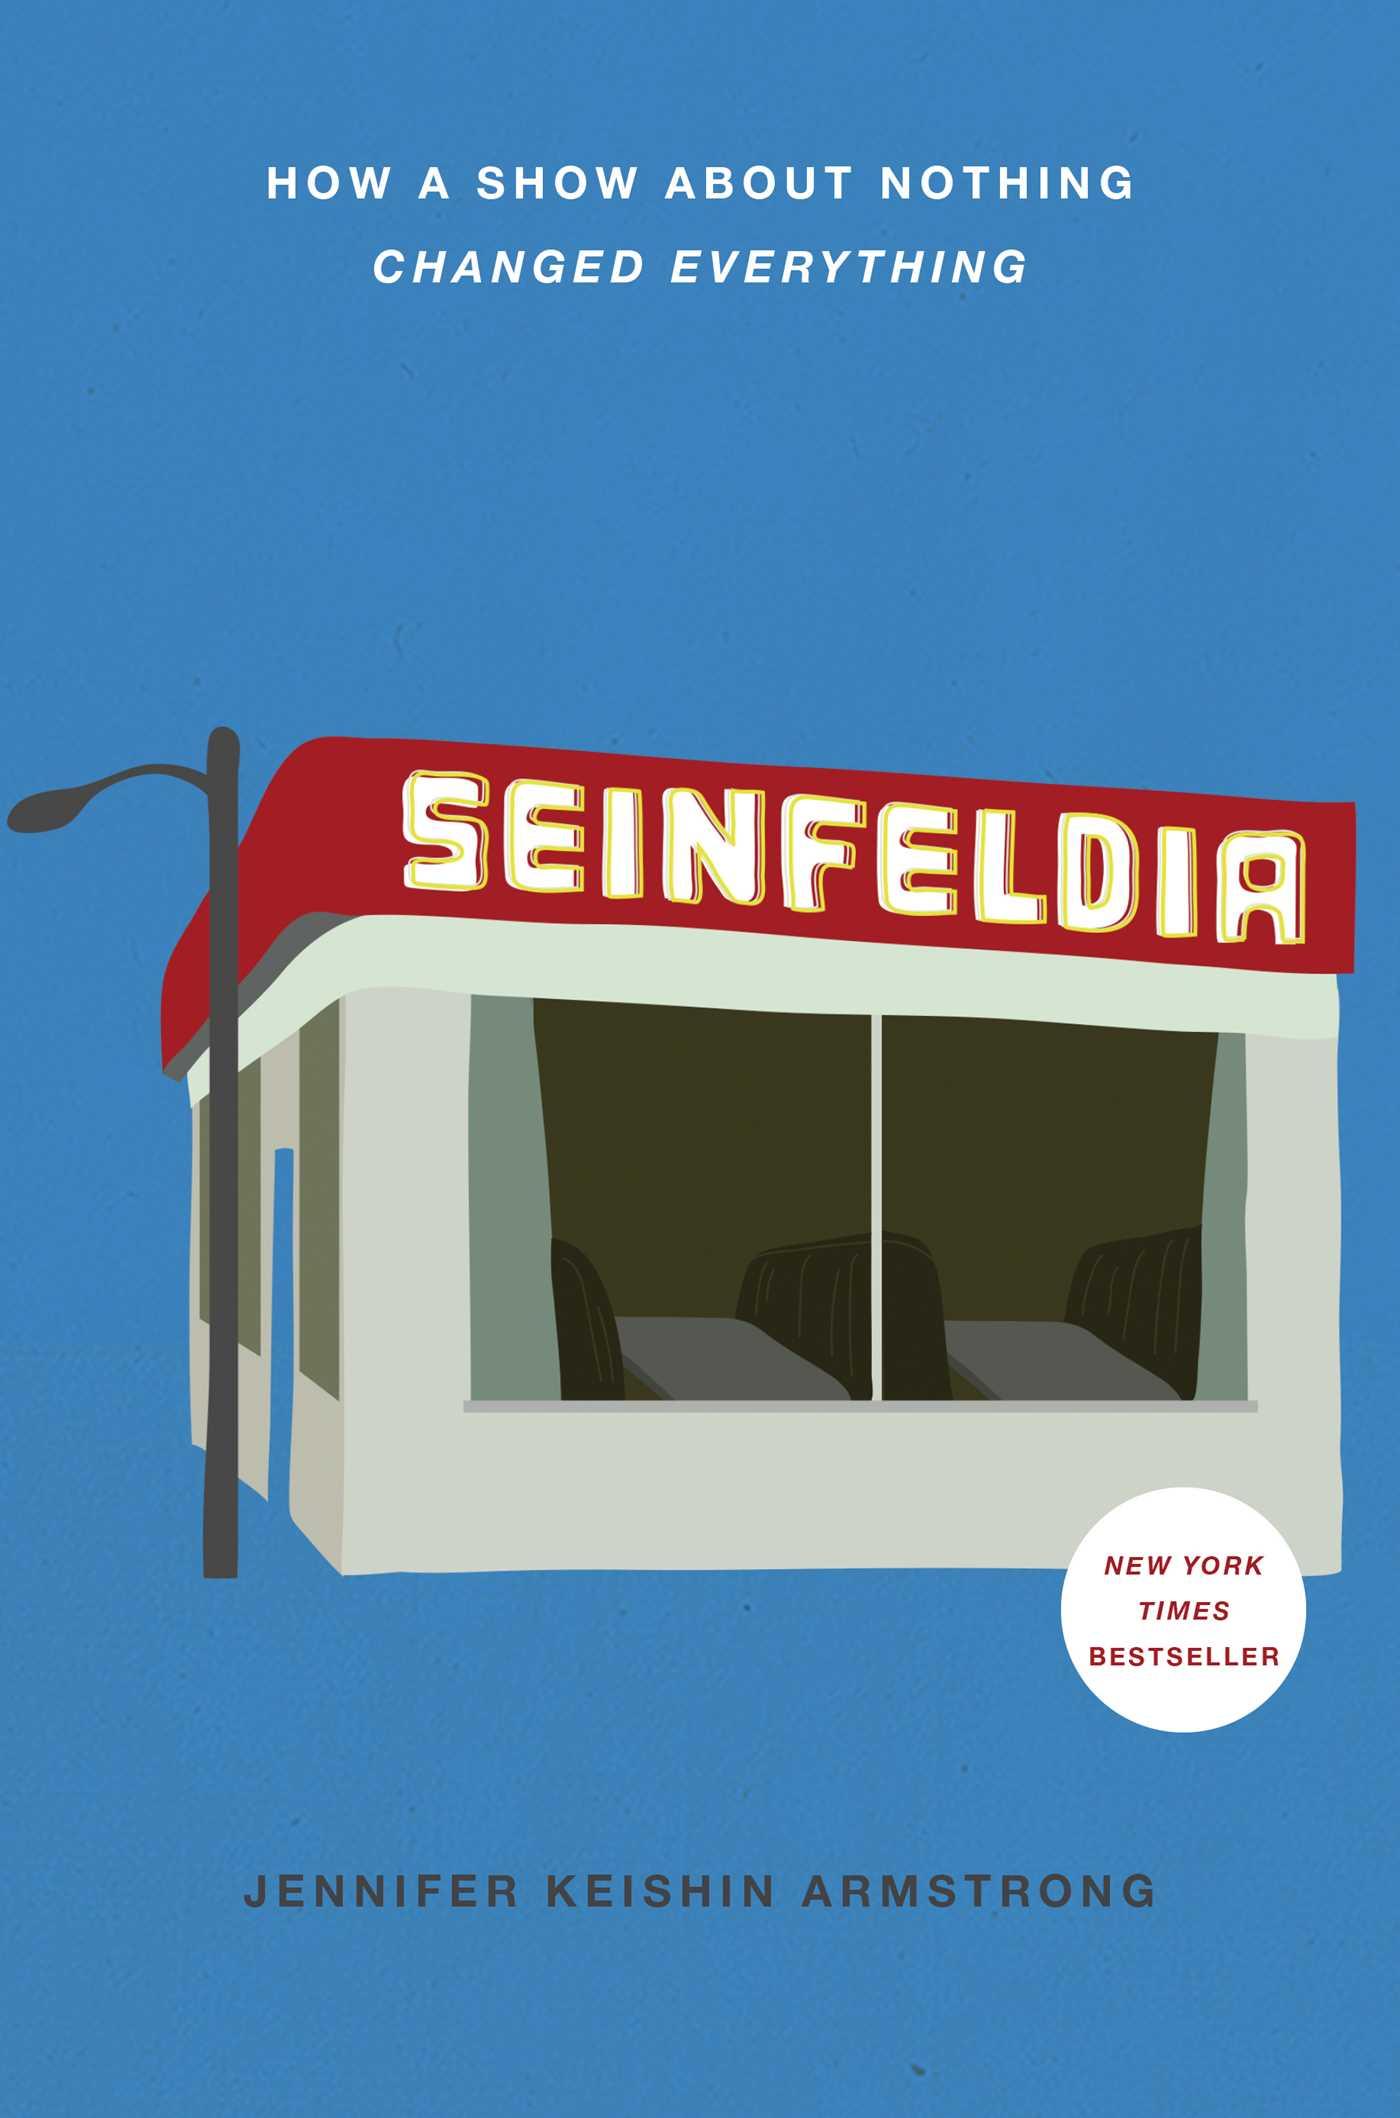 Seinfeldia 9781476756103 hr